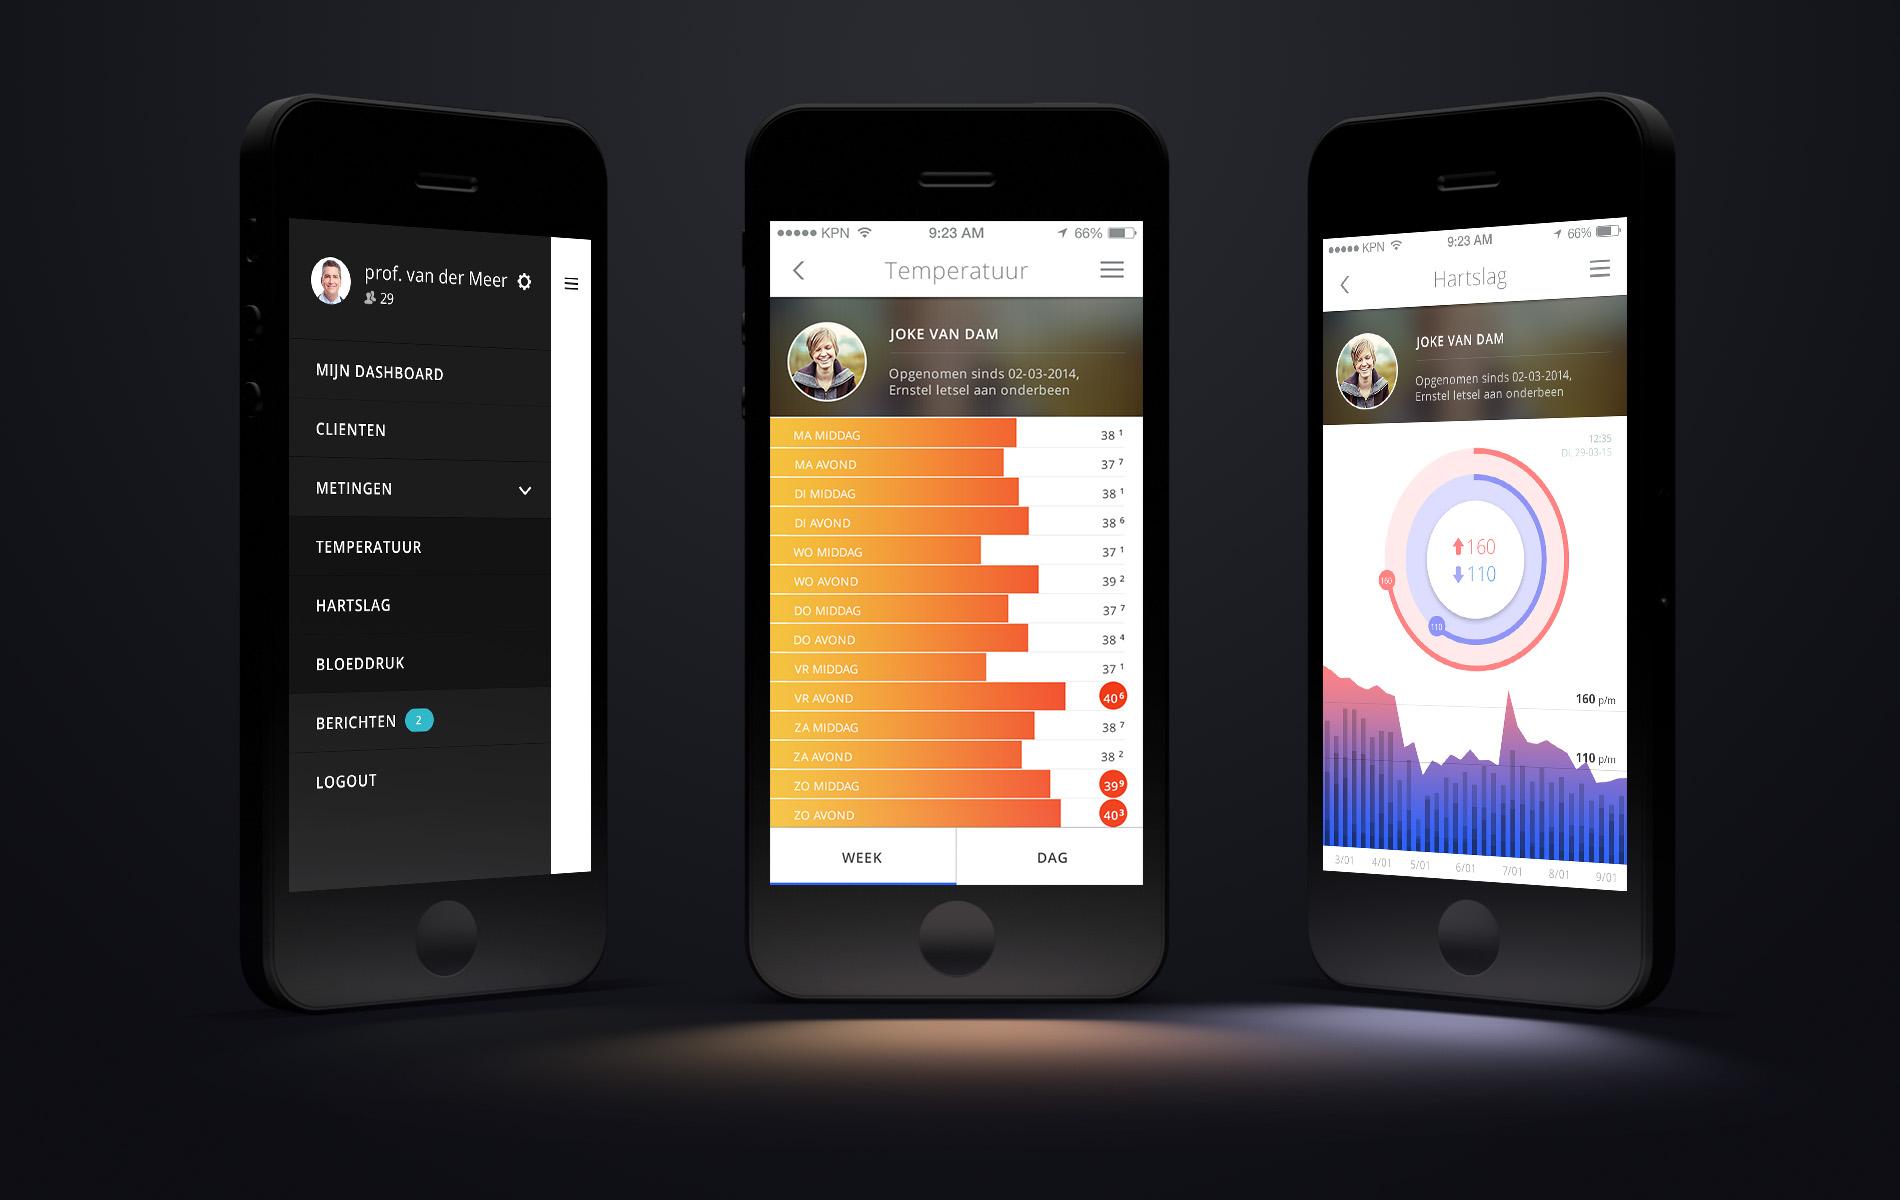 Vitale gegevens app